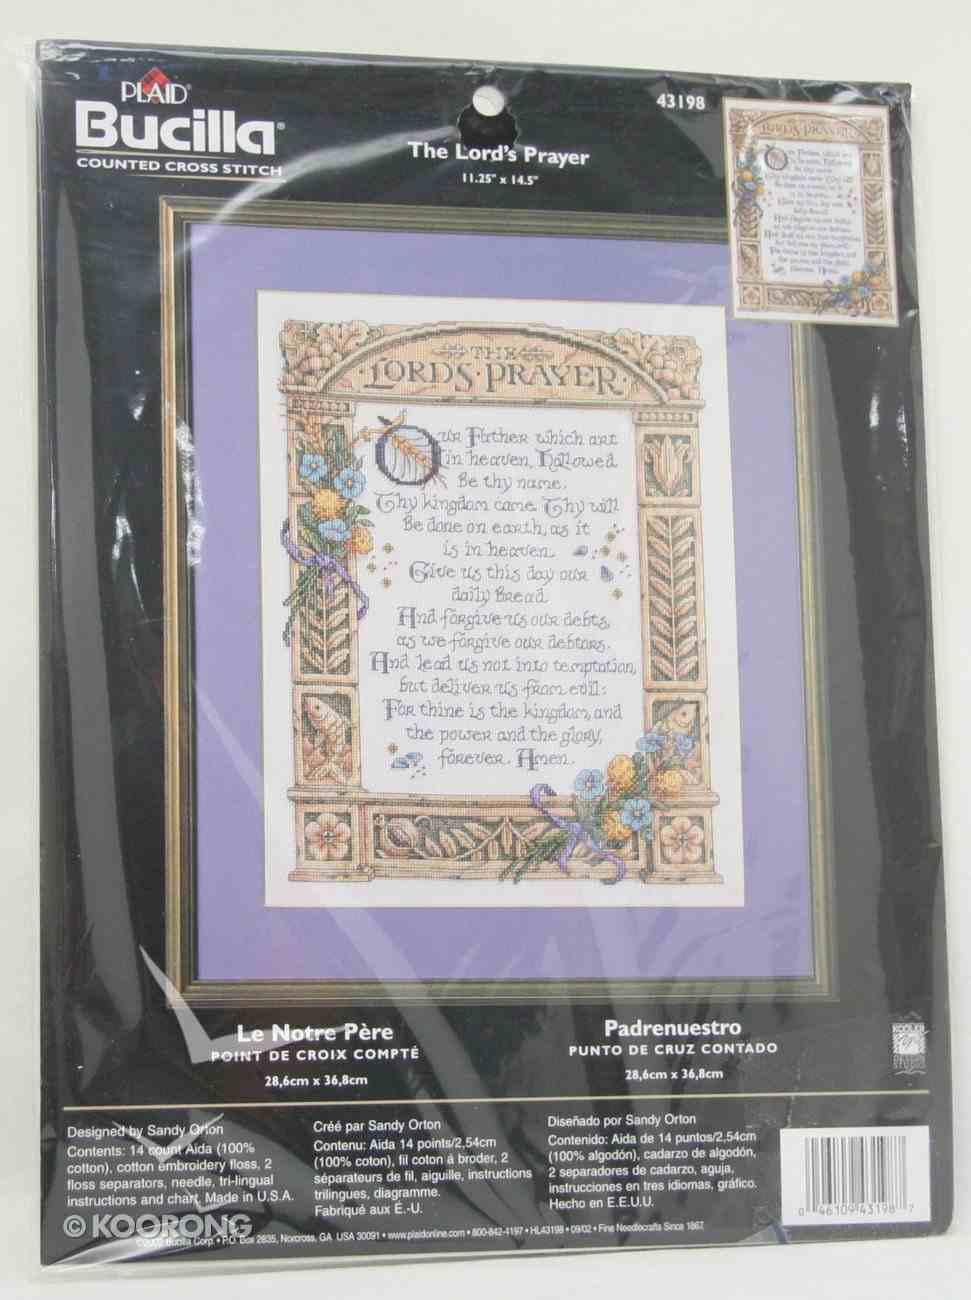 Cross Stitch: Lord's Prayer, the 28Cm X 36Cm Soft Goods